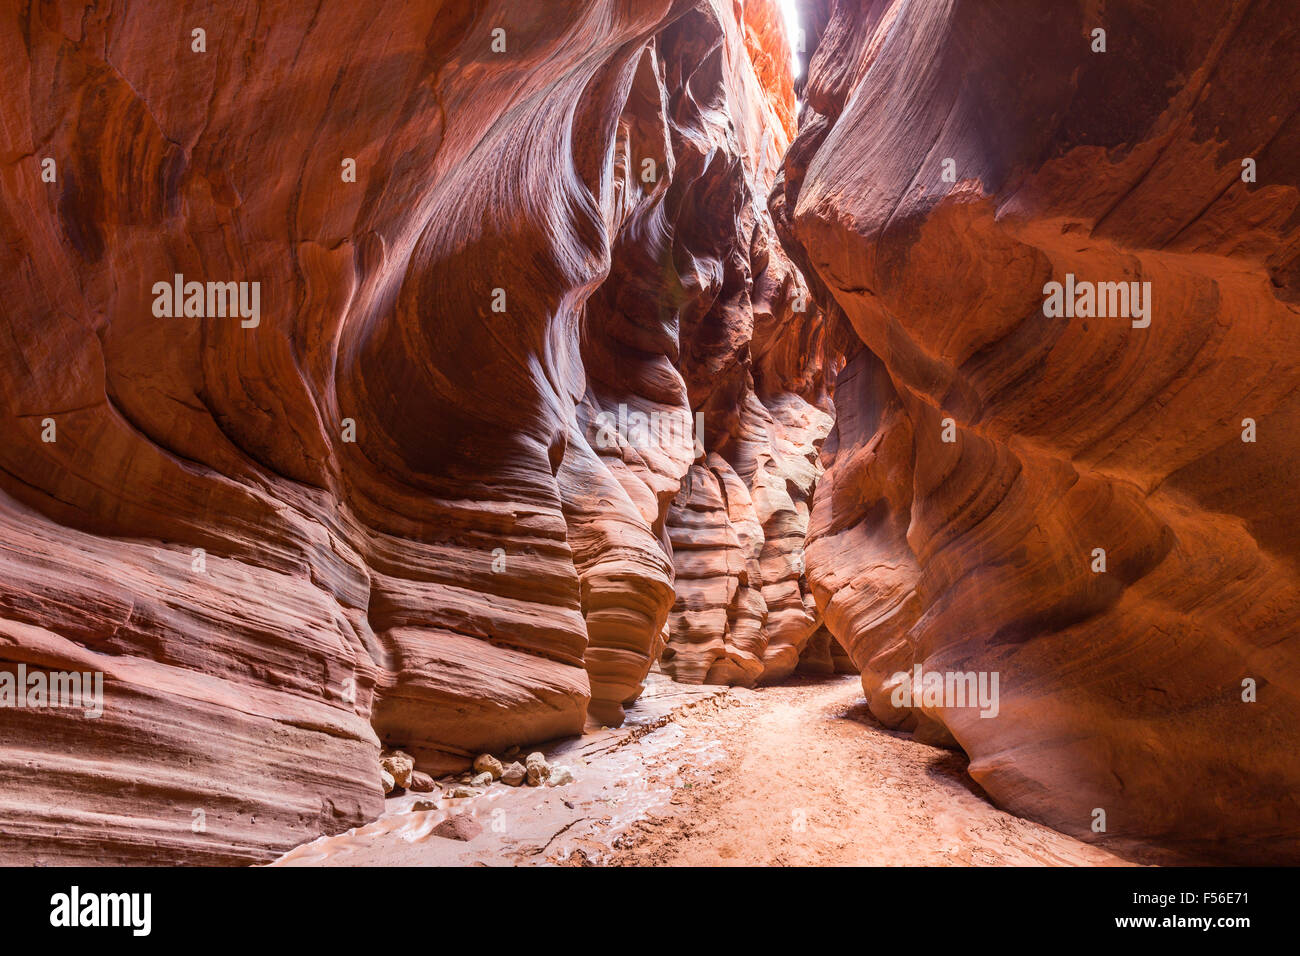 Narrow Wilderness Slot Canyon inside Buckskin Gulch in Southern Utah. Stock Photo